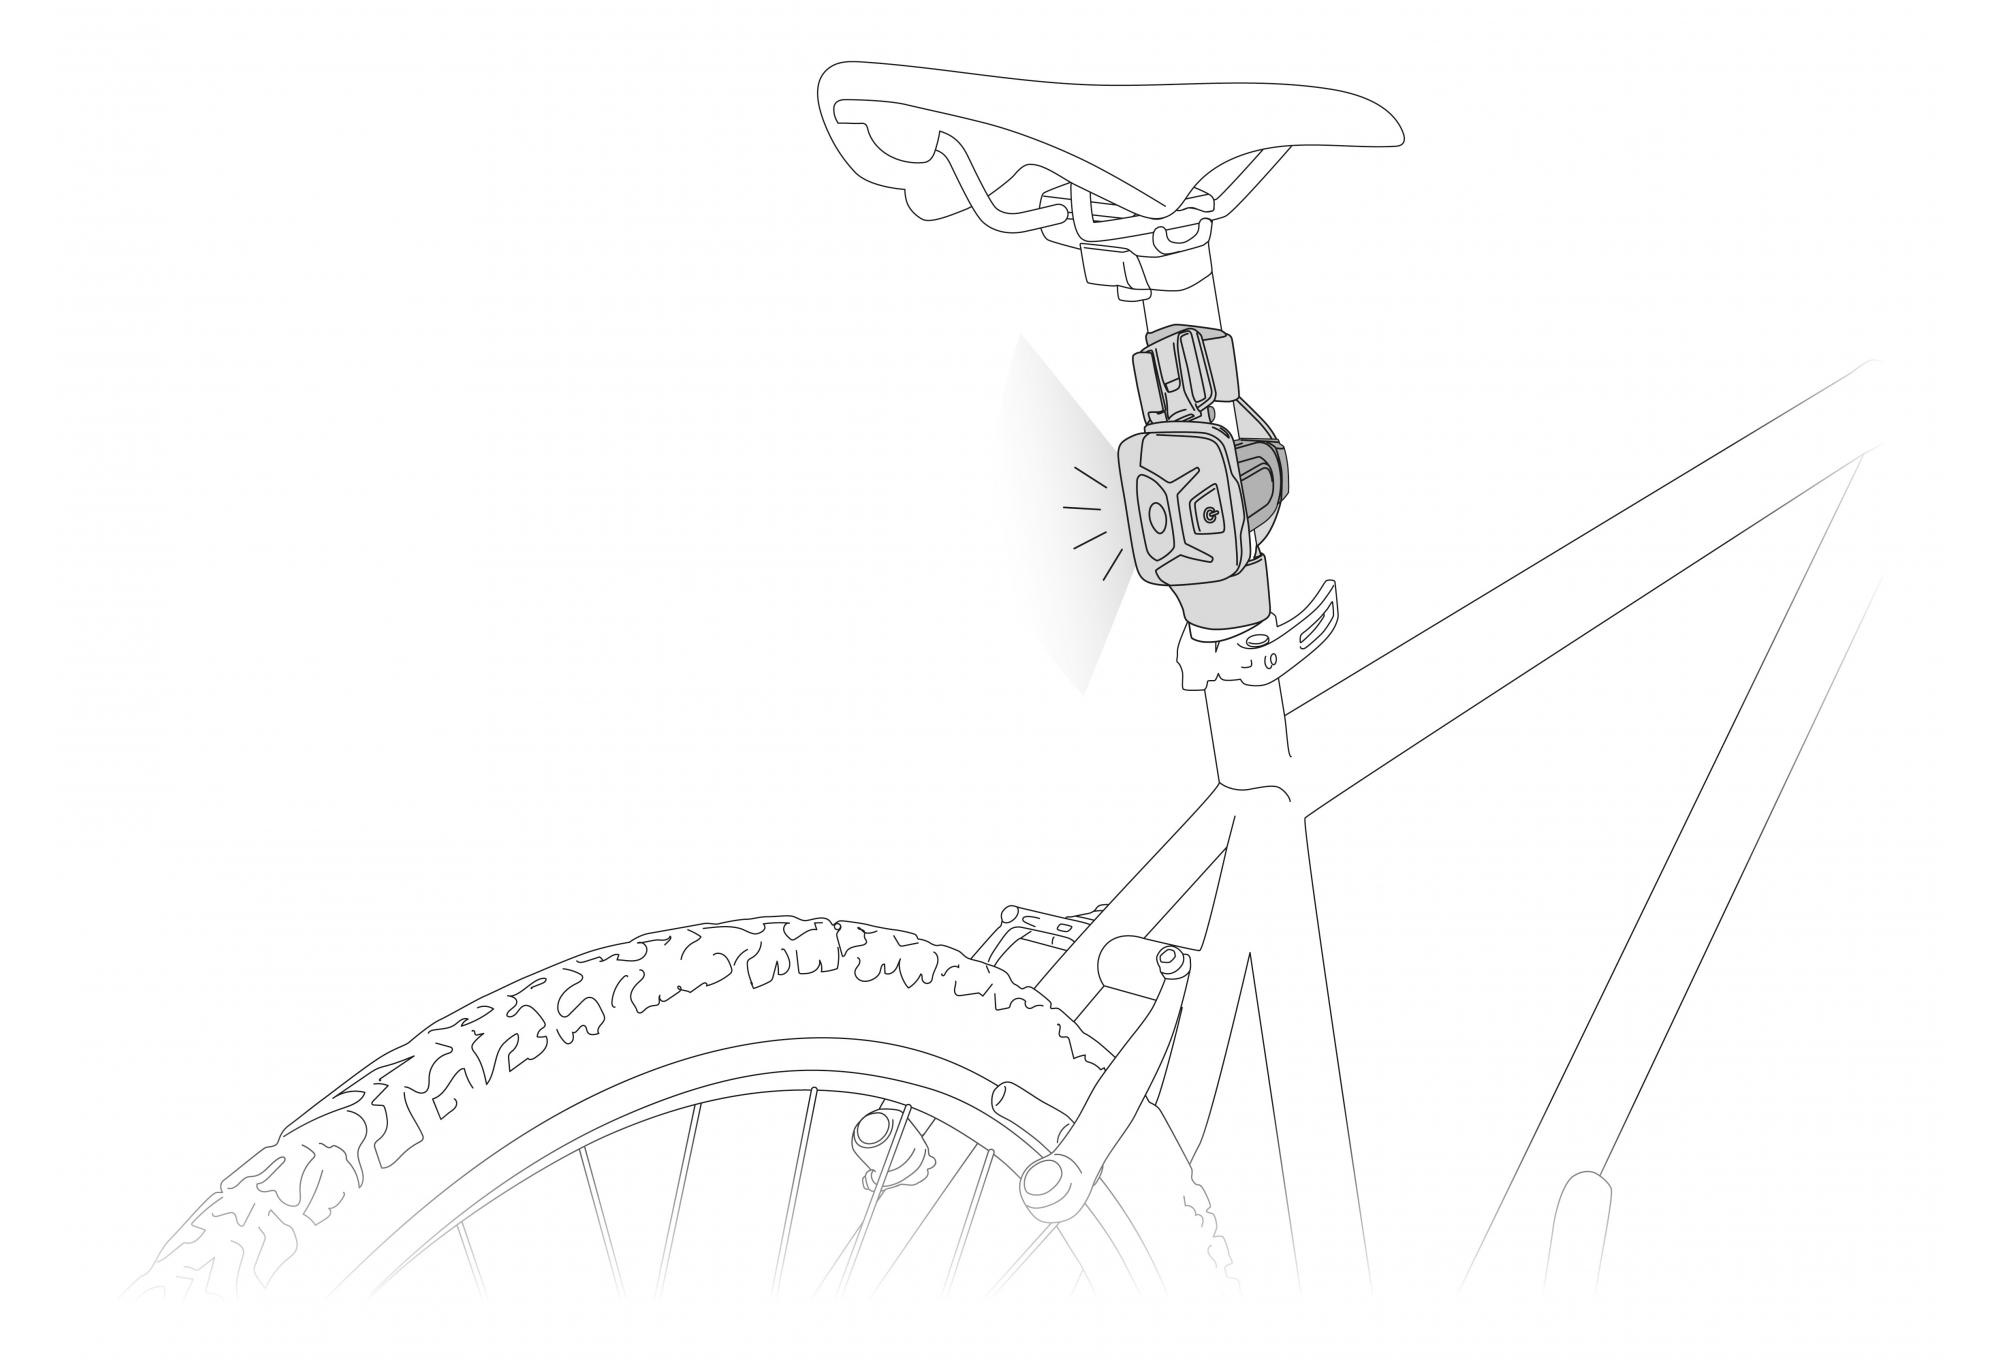 Seat Post Petzl Bike Adapt Plate To Mount Petzl Headlamp Cycle Handlebars